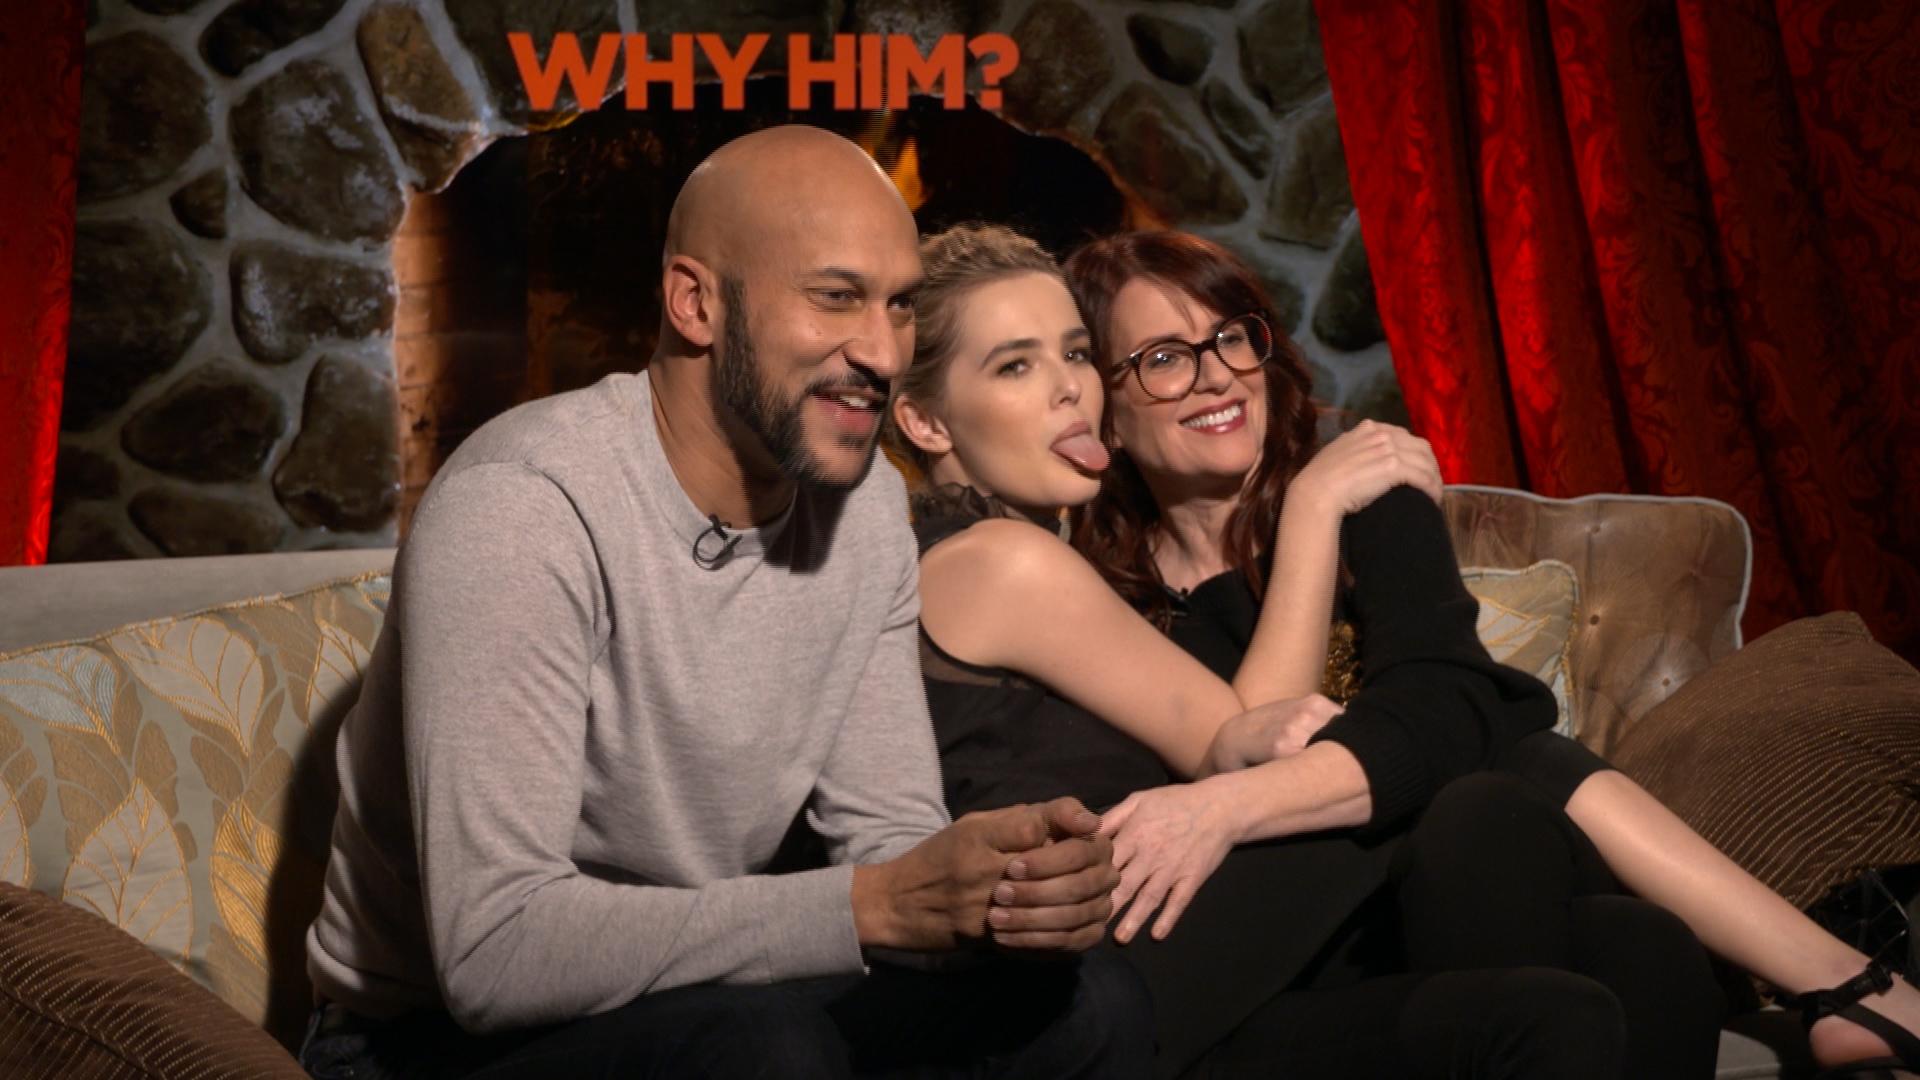 Megan Mullally, Zoey Deutch & Keegan Michael Key Why Him